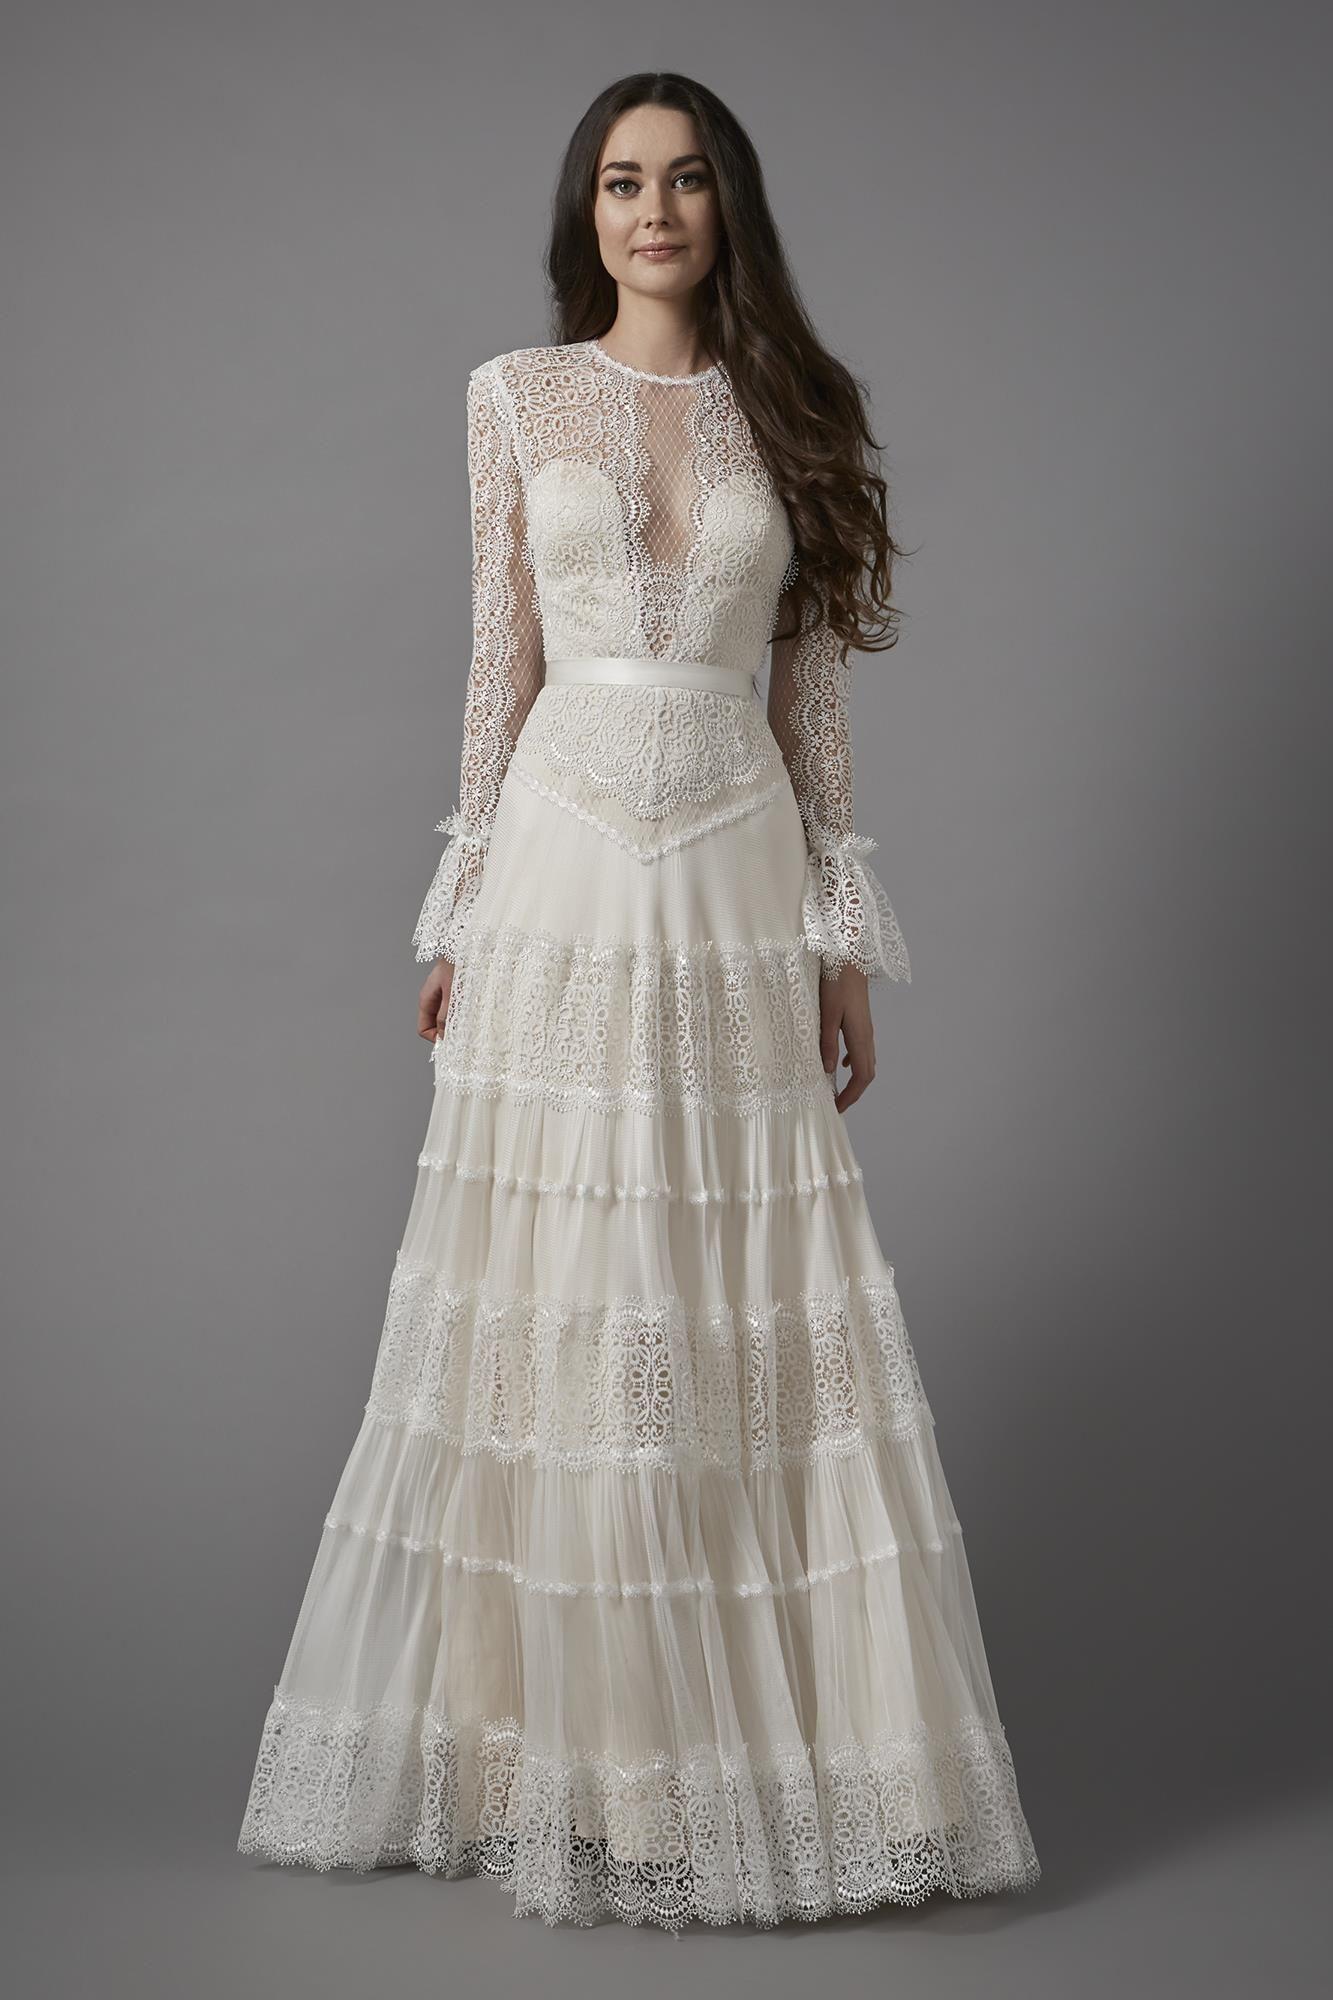 Vintage Style Lace Wedding Dress By Catherine Deane Catherine Deane Wedding Dress Wedding Dress Long Sleeve Wedding Dresses Lace